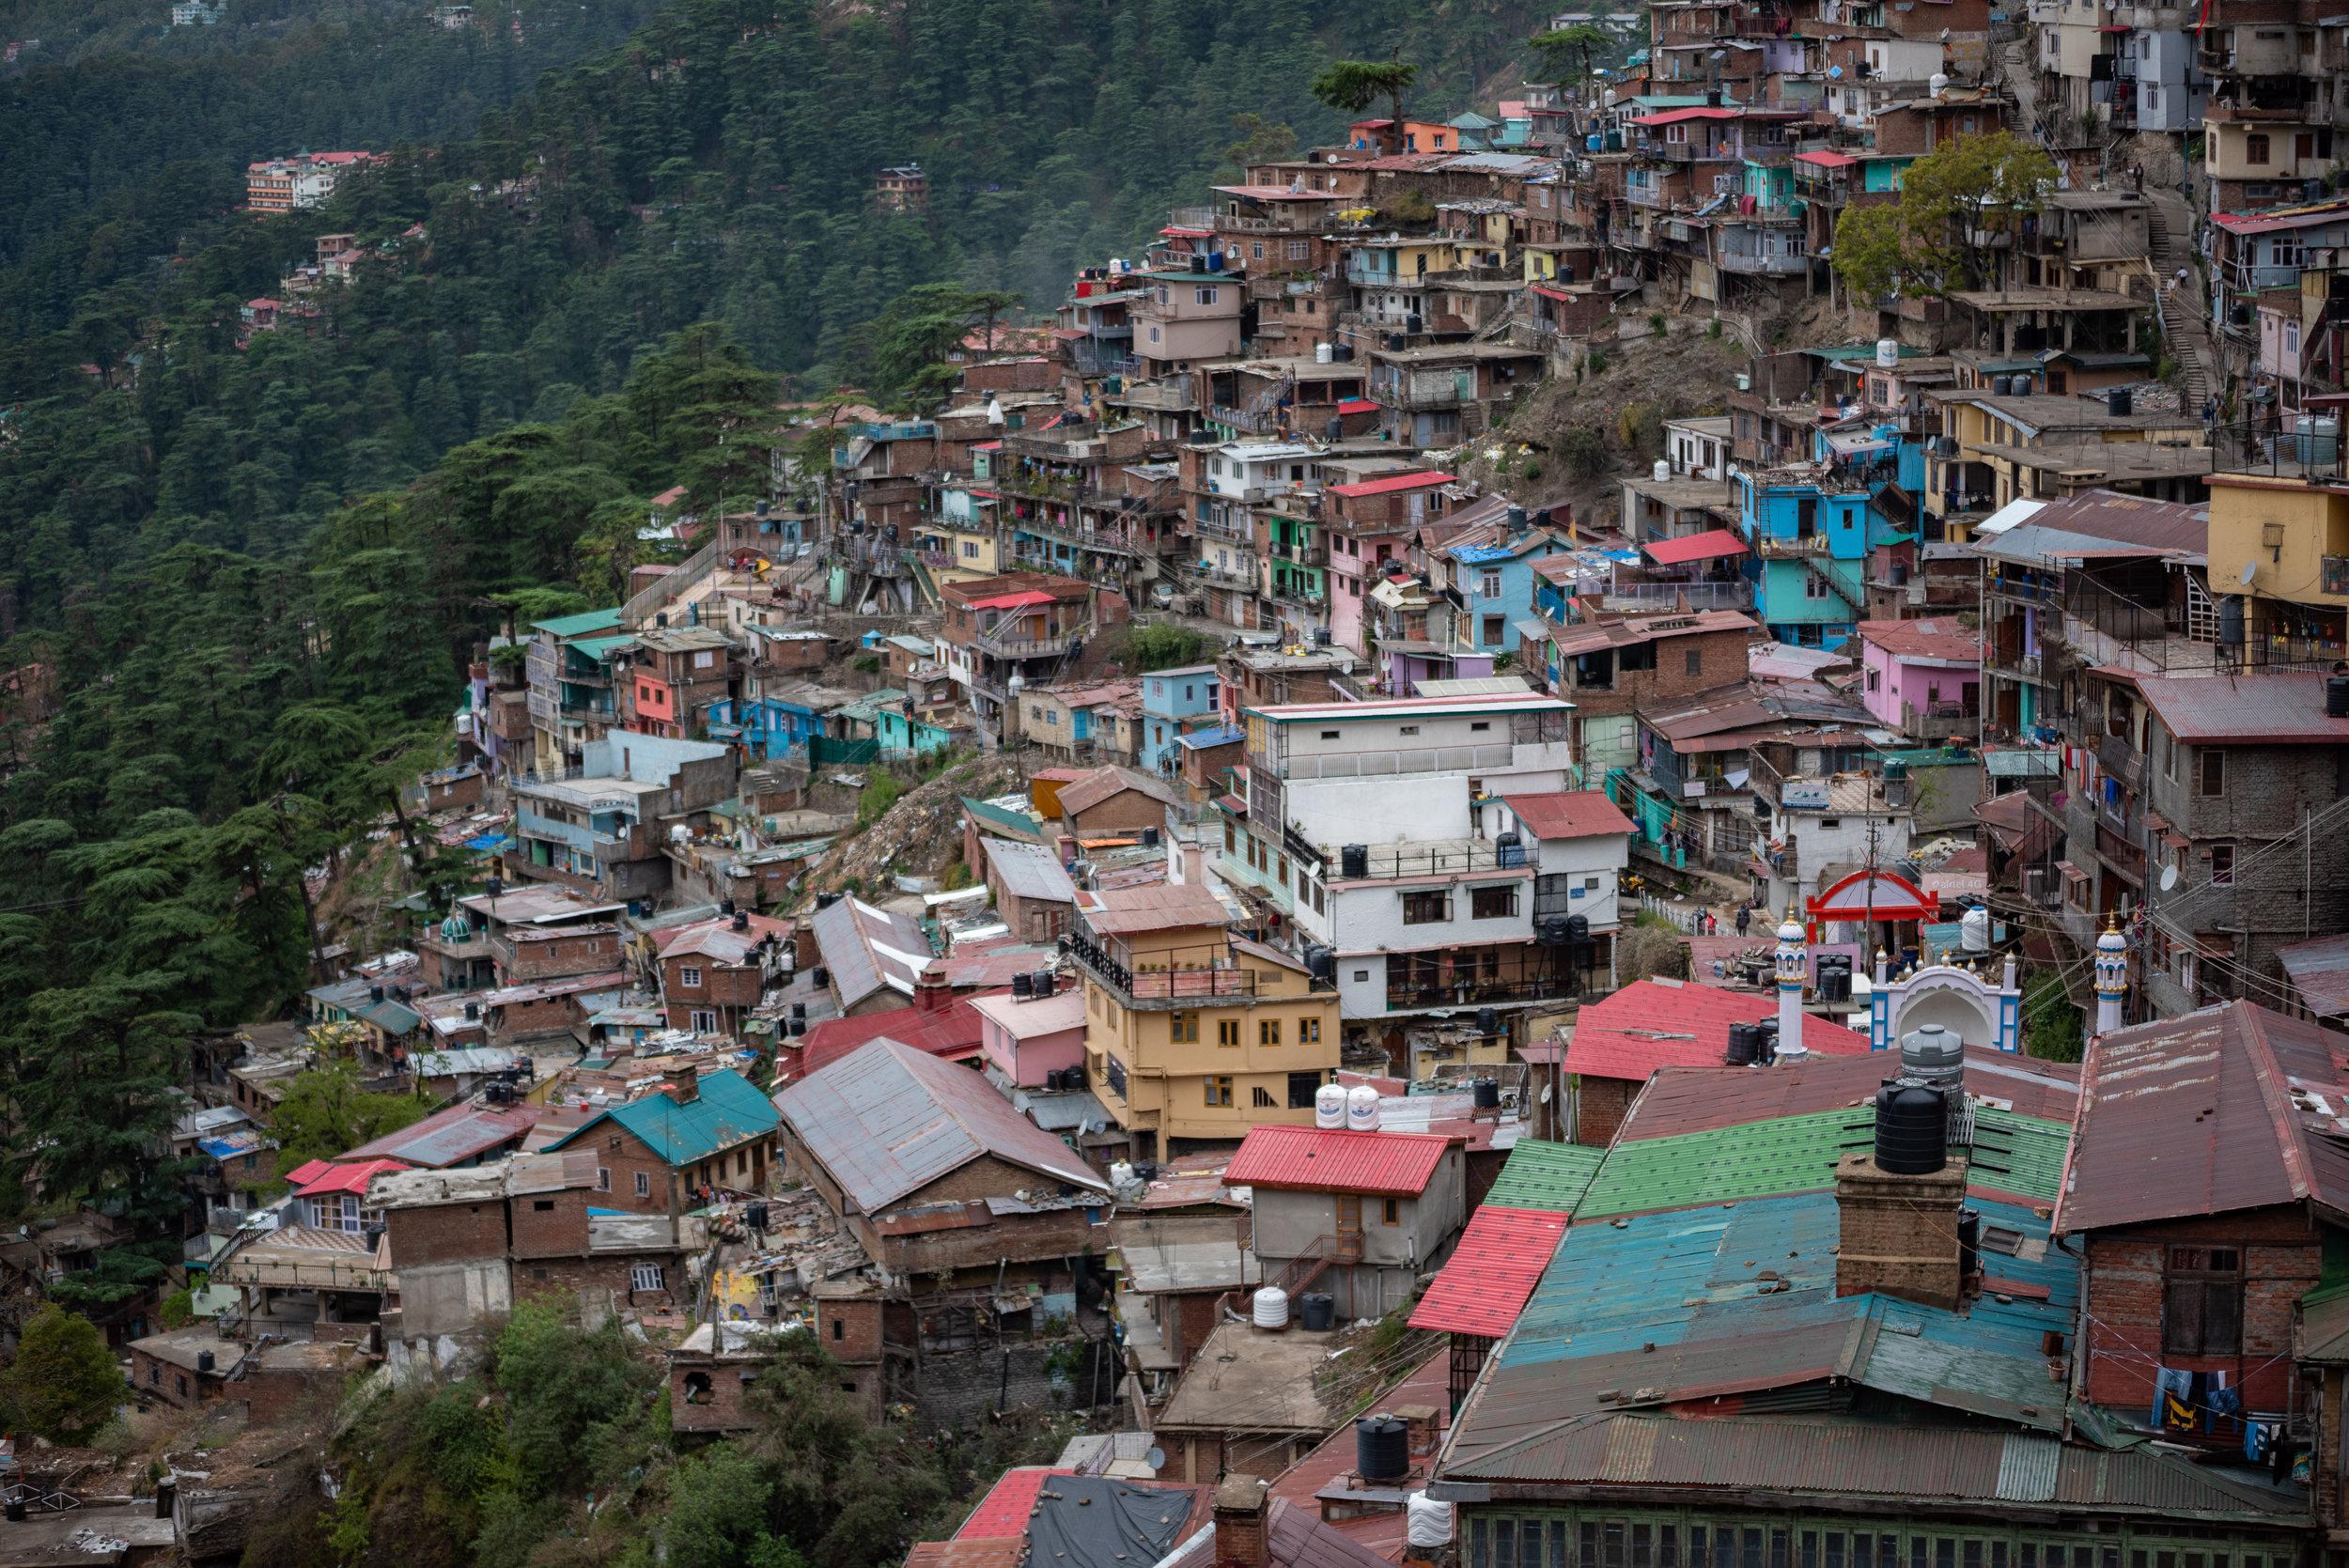 Krishnanagar laid out along the lower hill slopes of Shimla